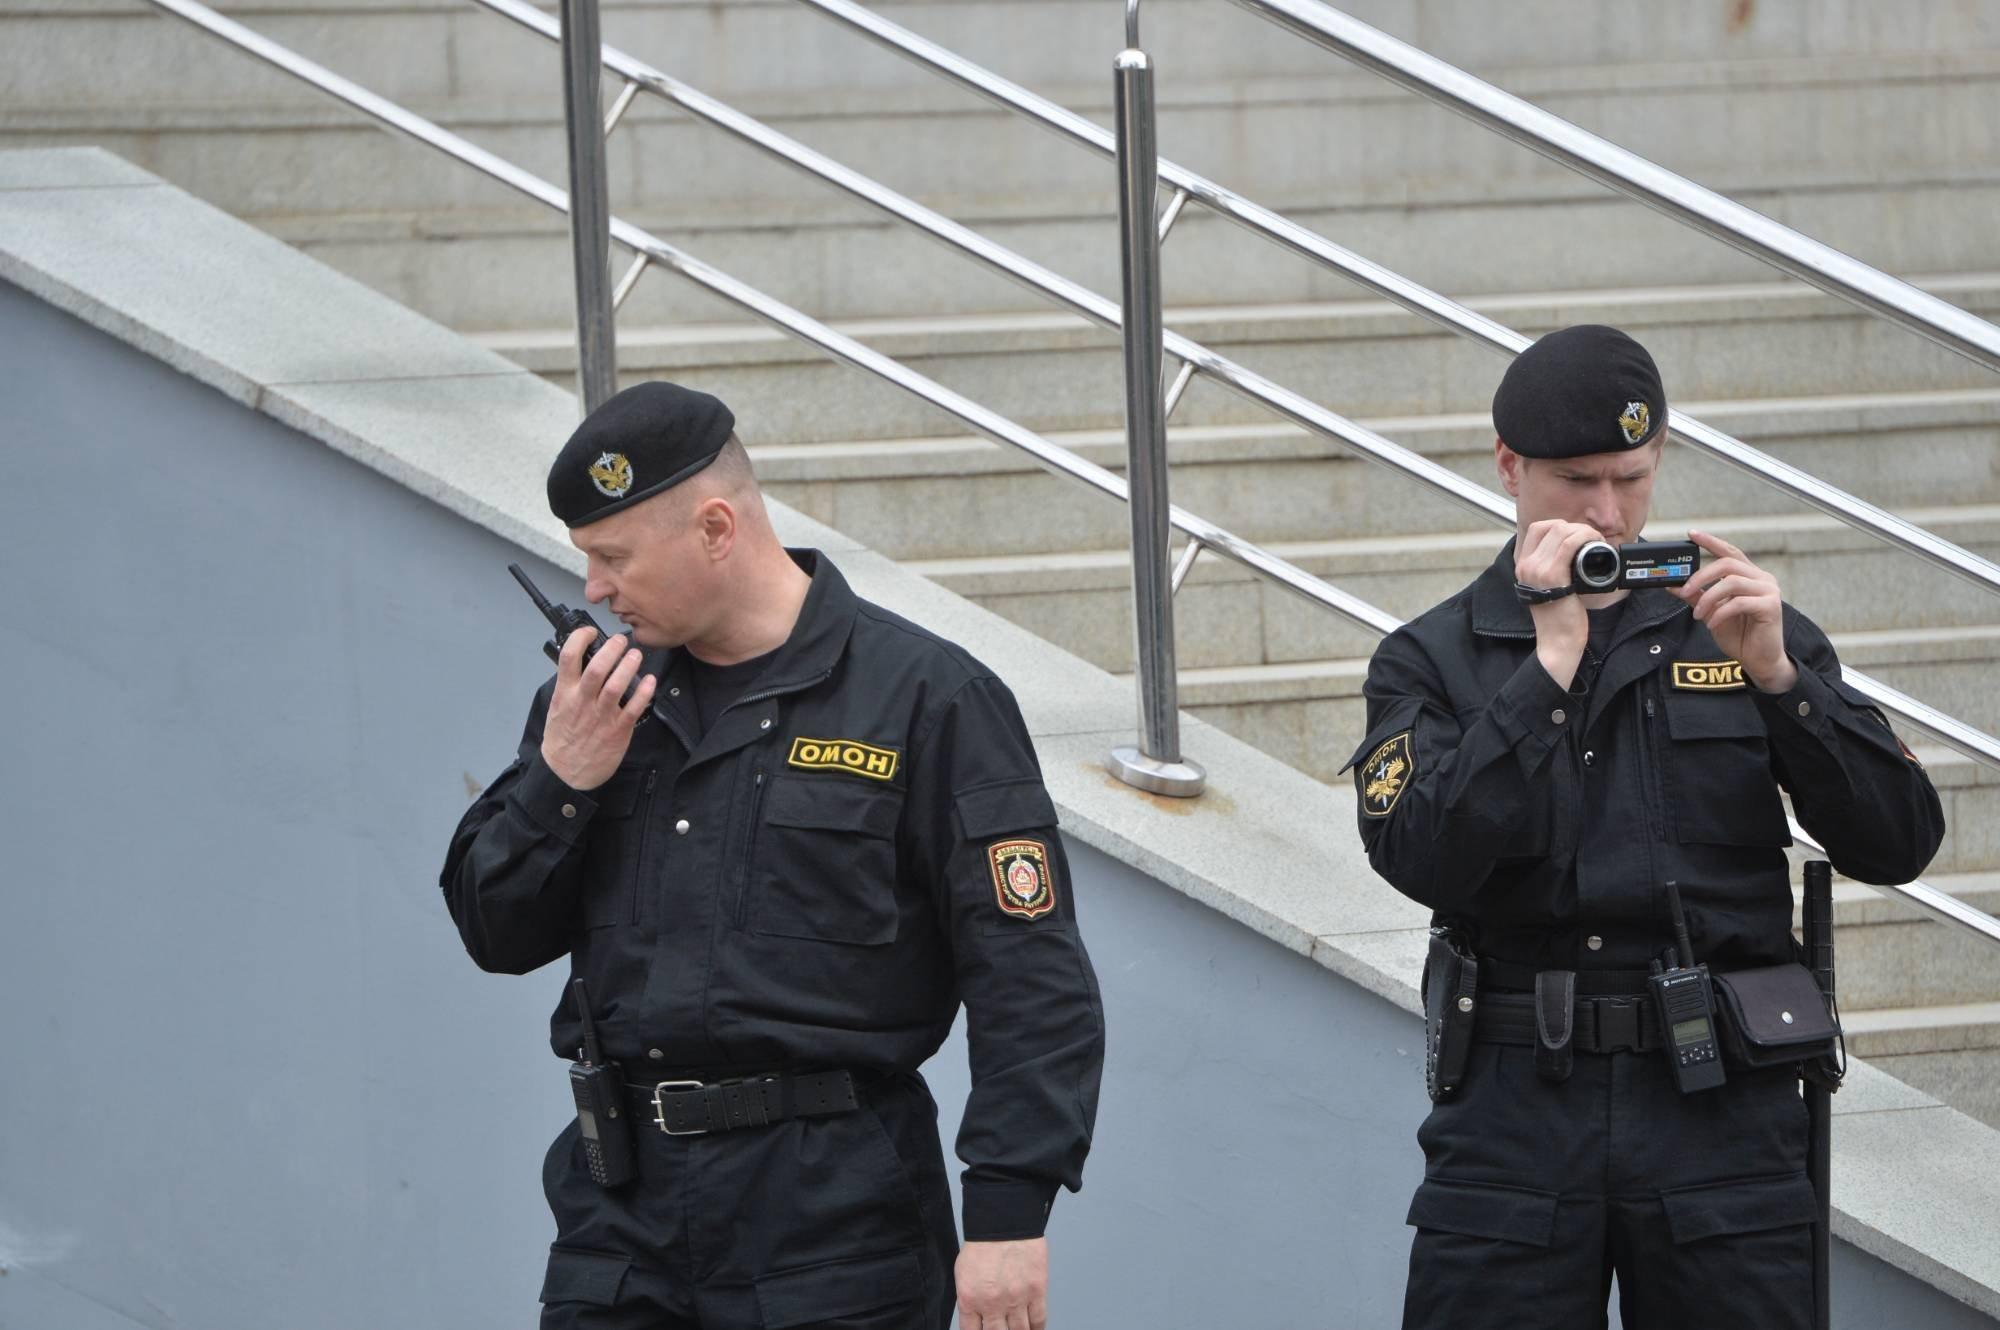 Сотрудники ОМОН возле кинотеатра Октябрь